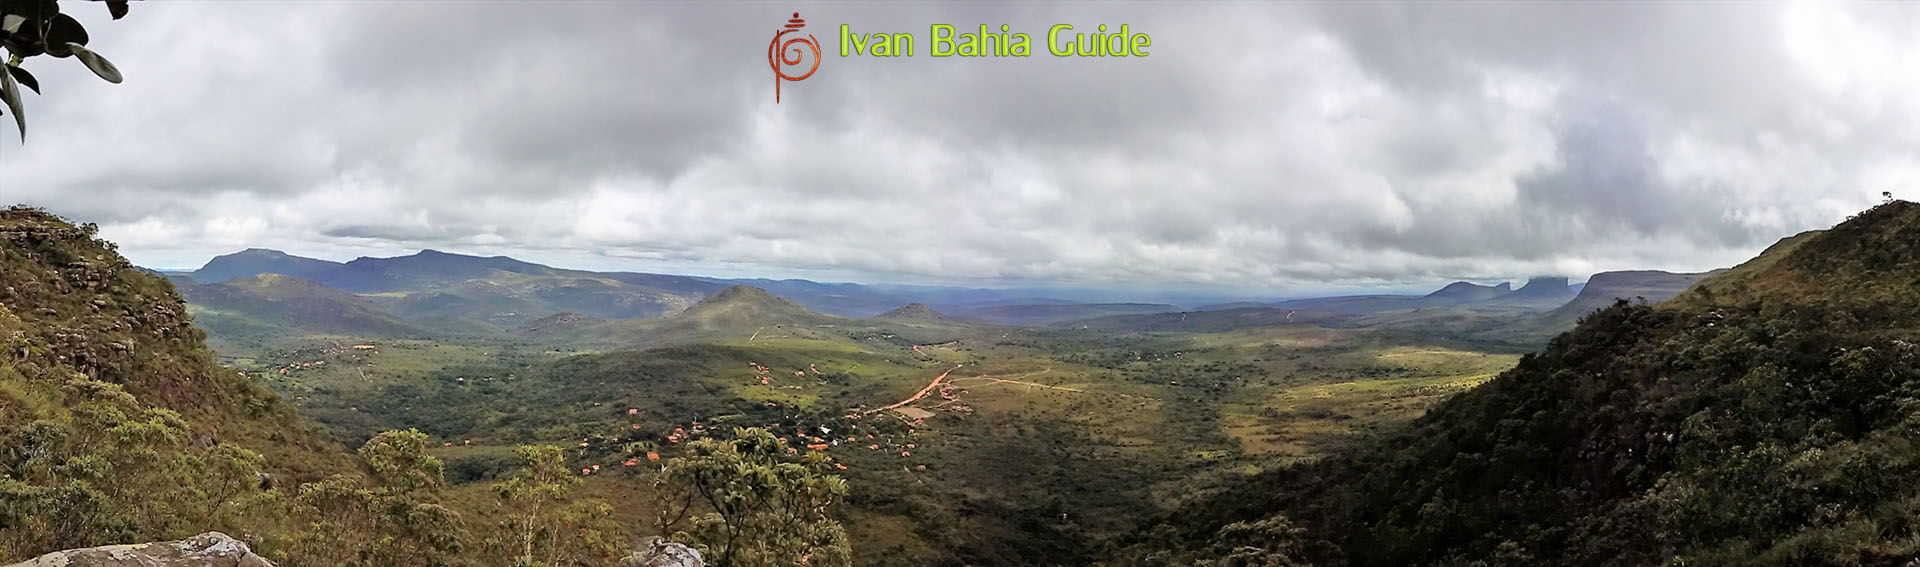 Ivan Bahia tour-guide / hiking in Chapada Diamantina National Park (aka 'the Brazilian Grand Canyon') mountain views